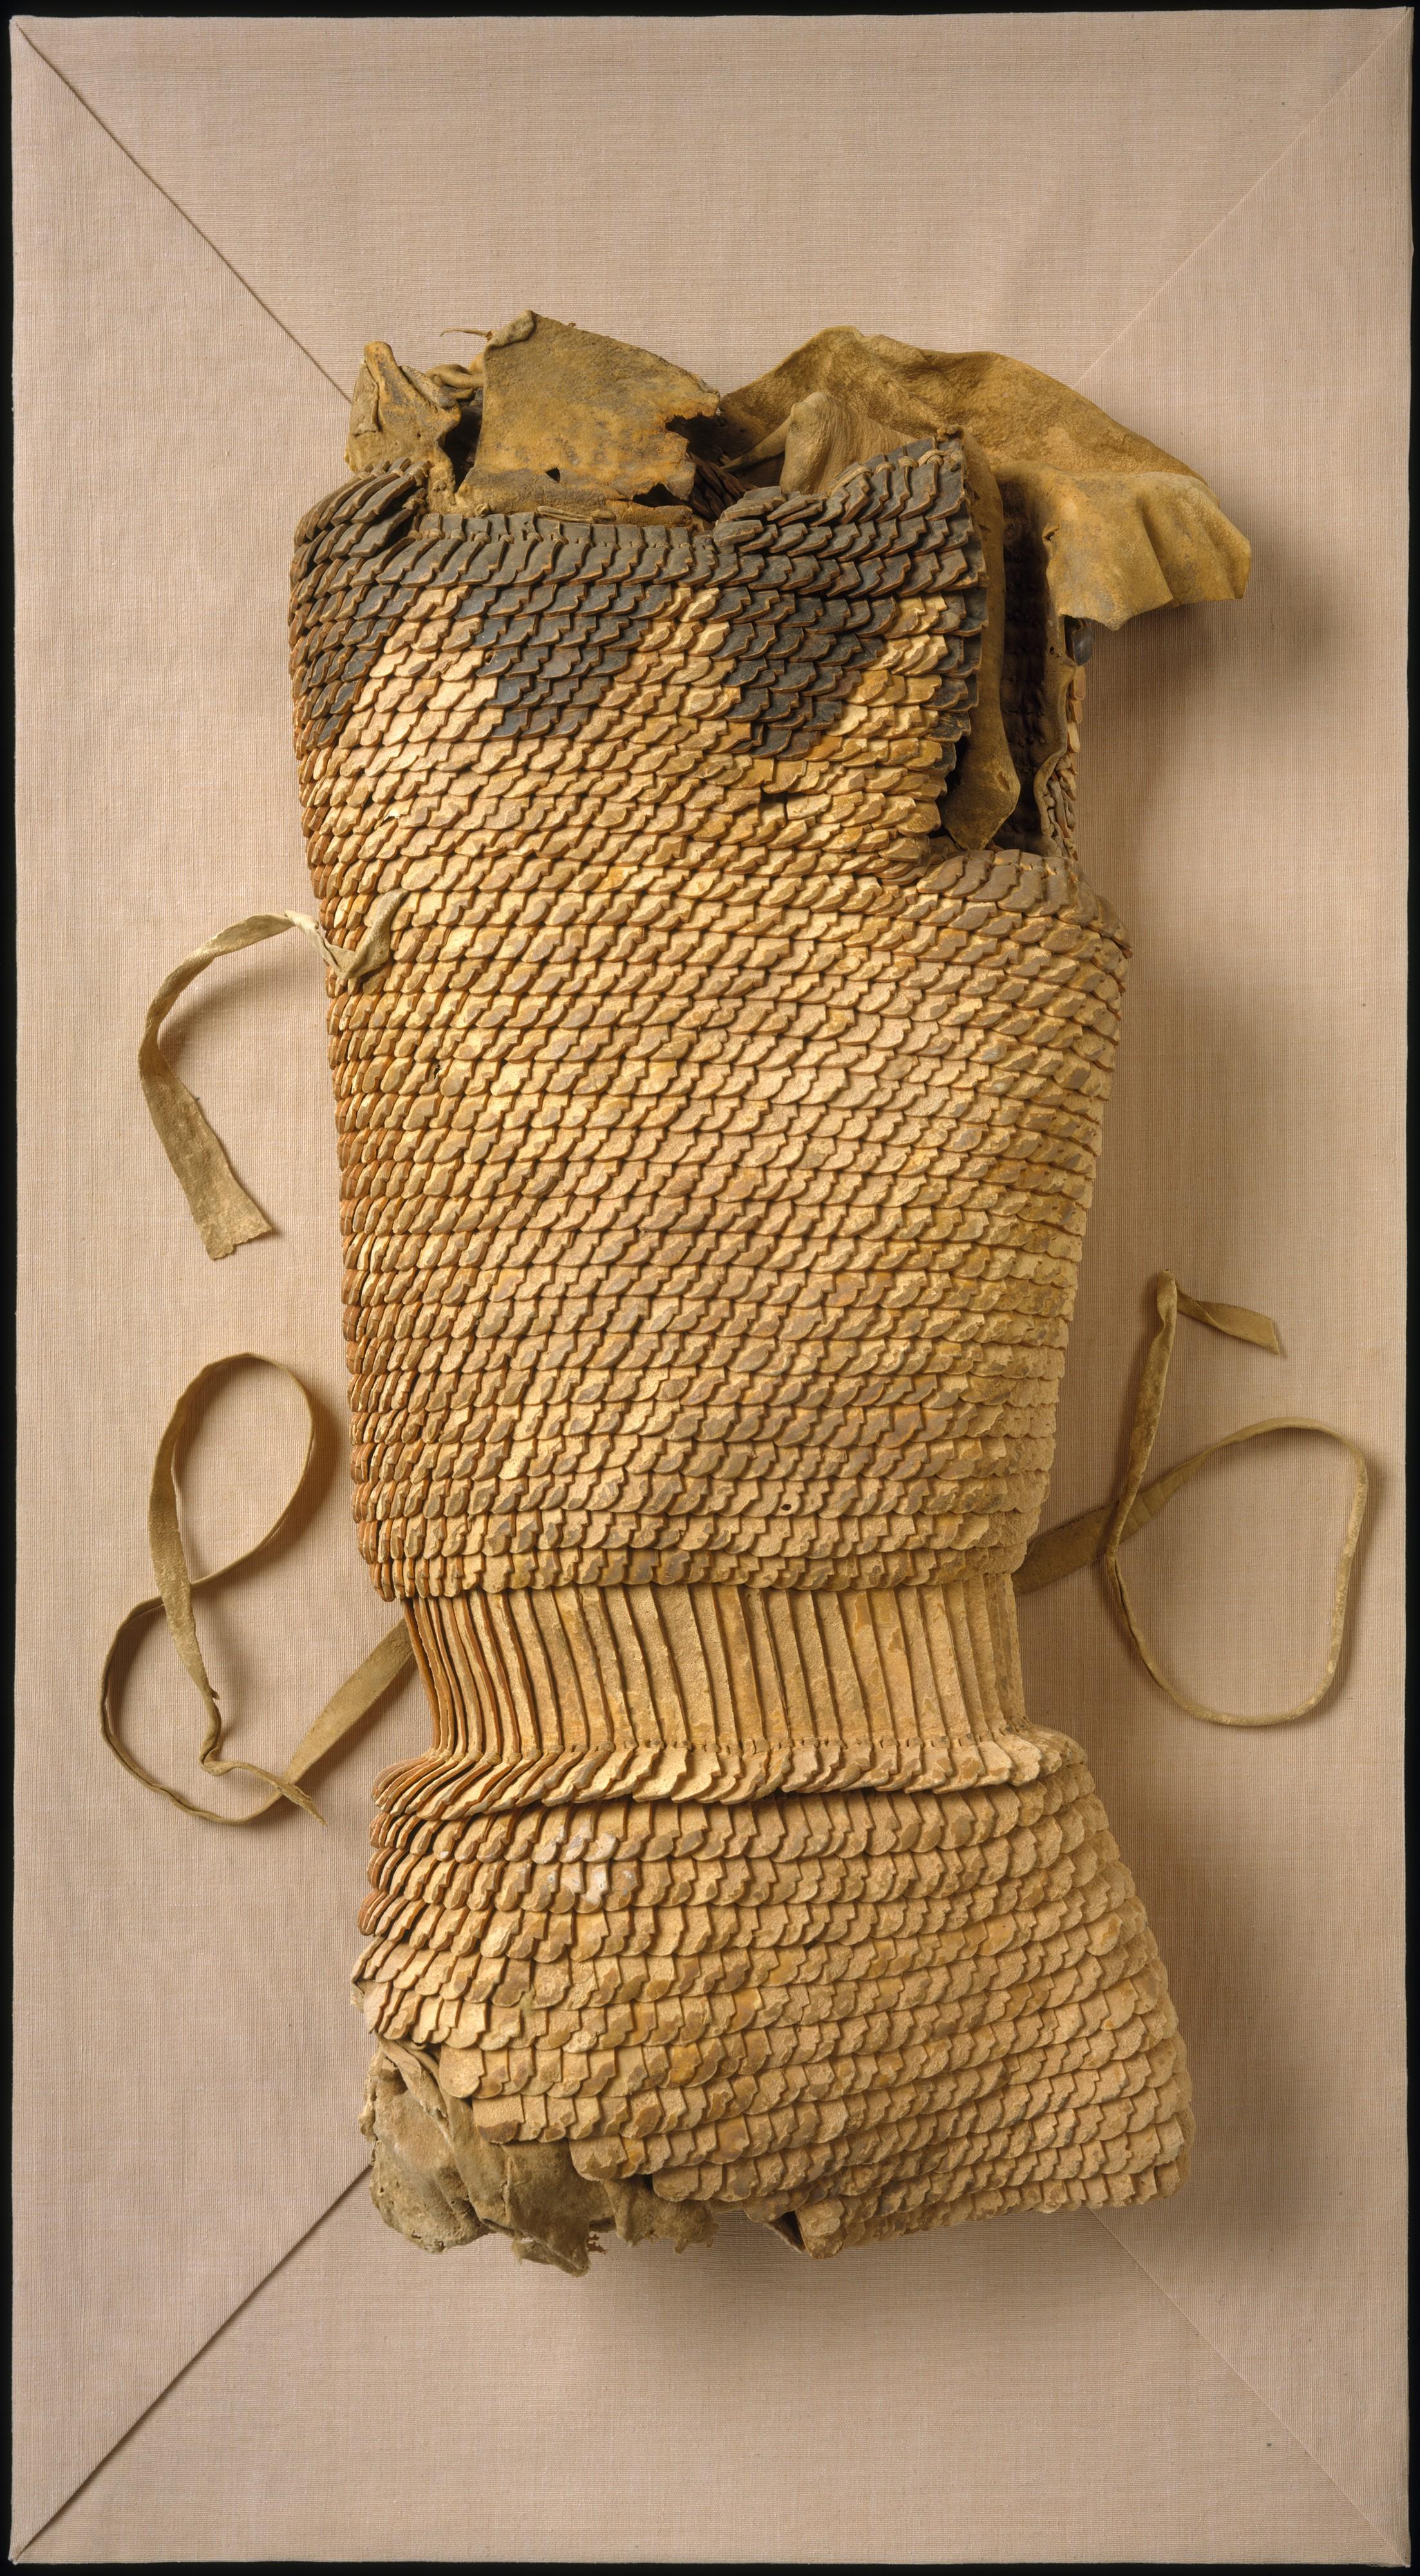 Scale Armor Subeixi Or Scythian The Metropolitan Museum Of Art